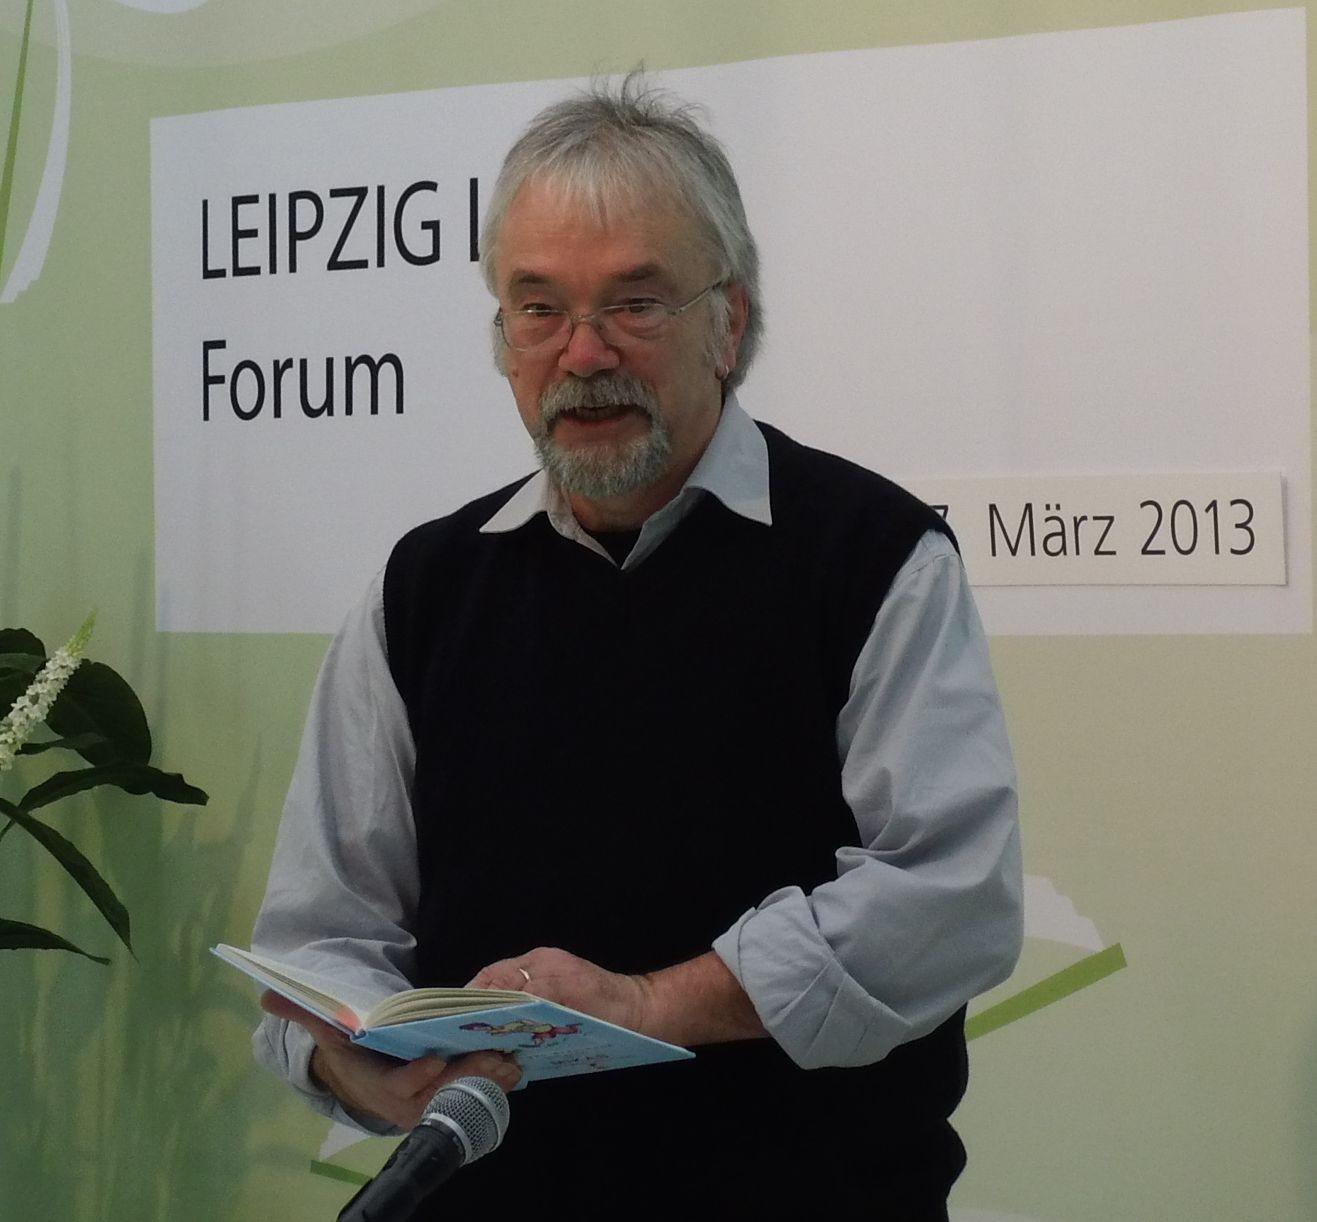 Jürgen Stahlbock